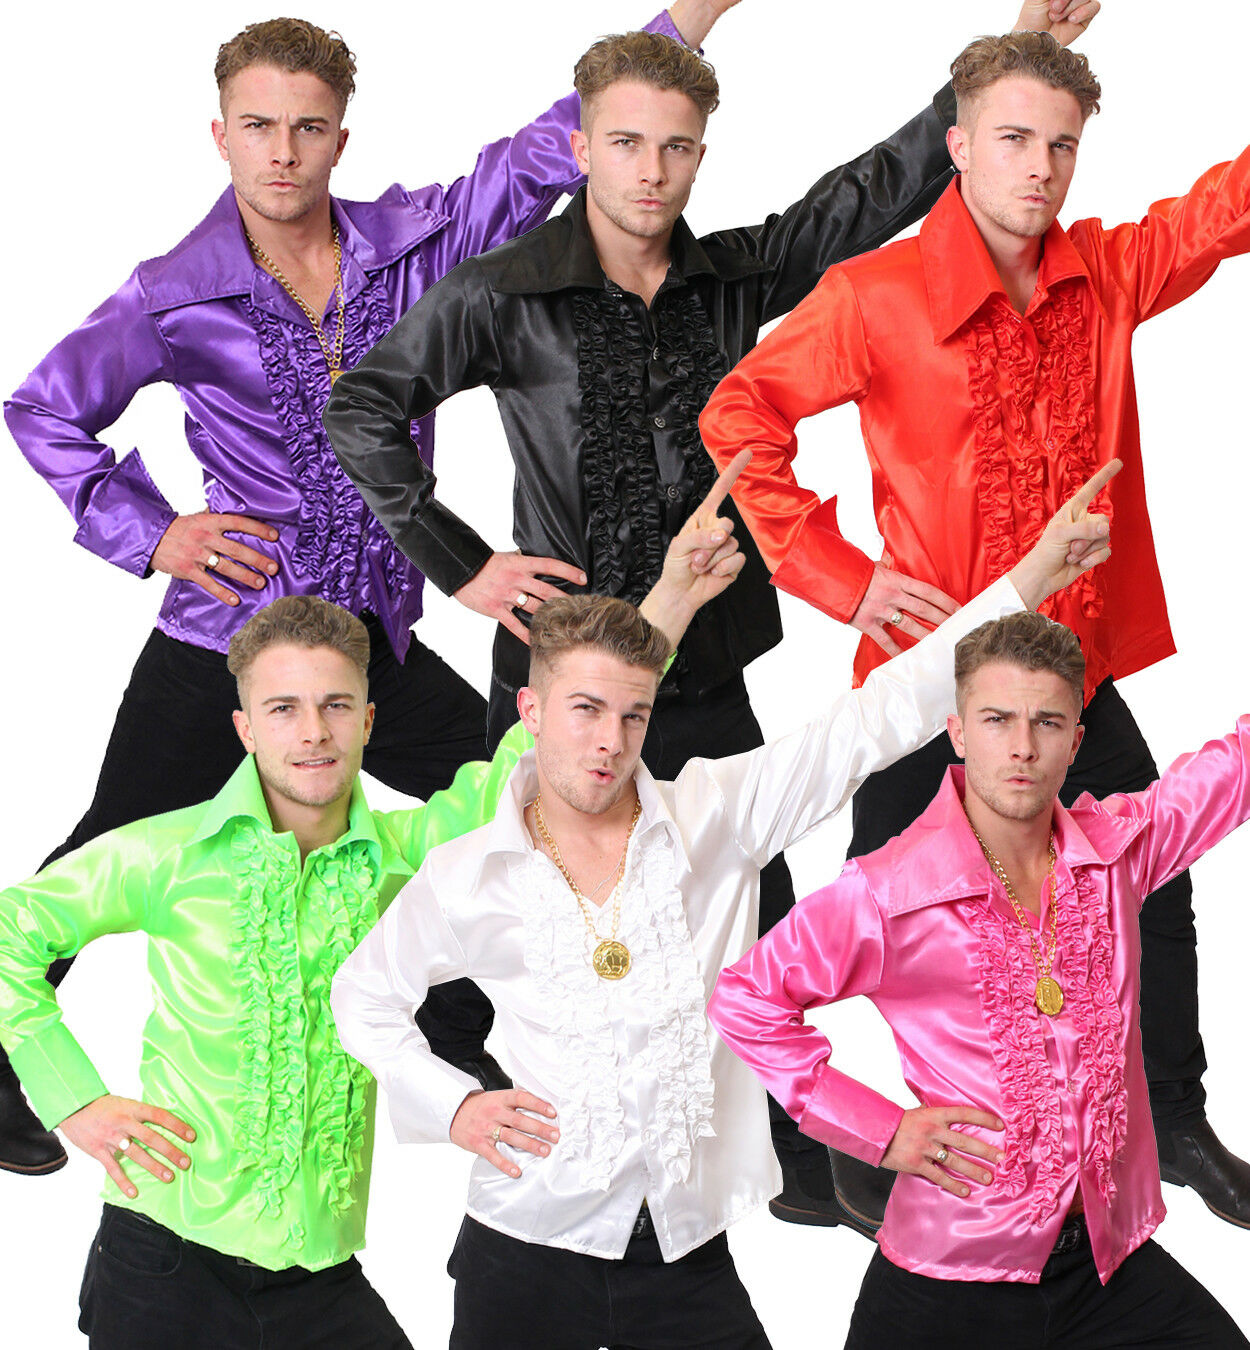 MENS PINK DISCO RUFFLE SHIRT ADULT FANCY DRESS COSTUME 60S 1970S S M L XL XXL